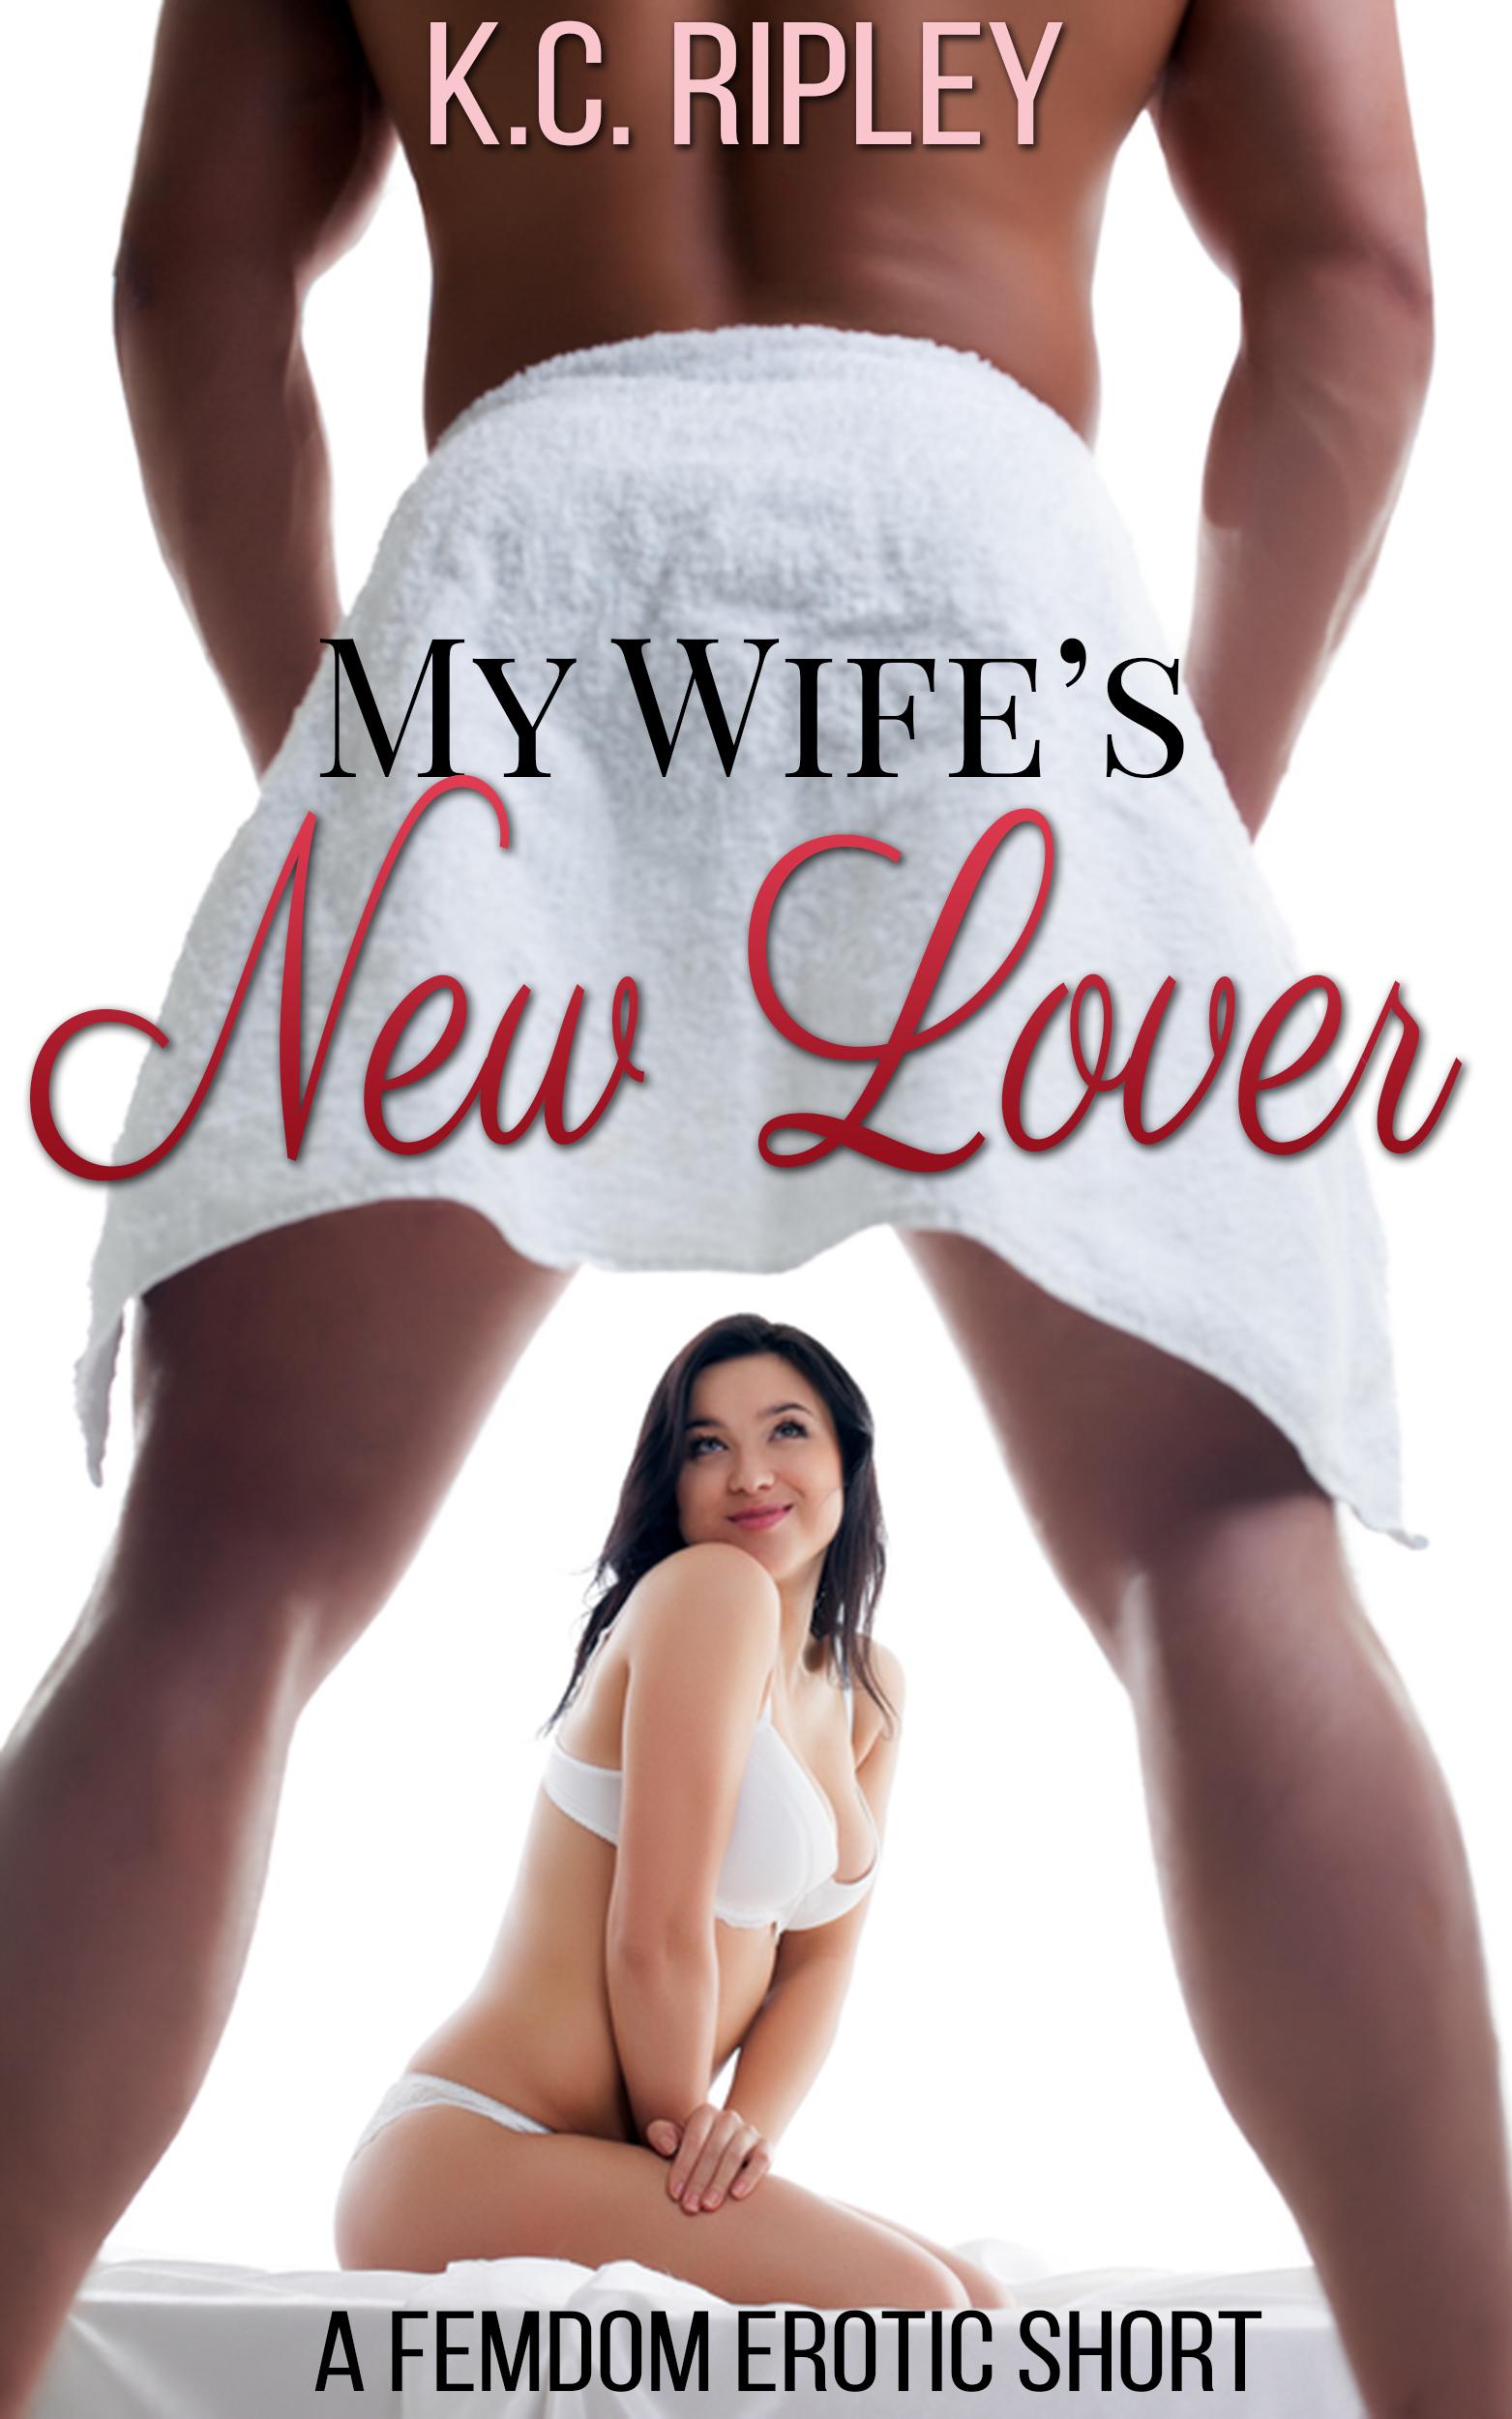 My Wifes New Lover: A FemDom Erotic Short K.C. Ripley